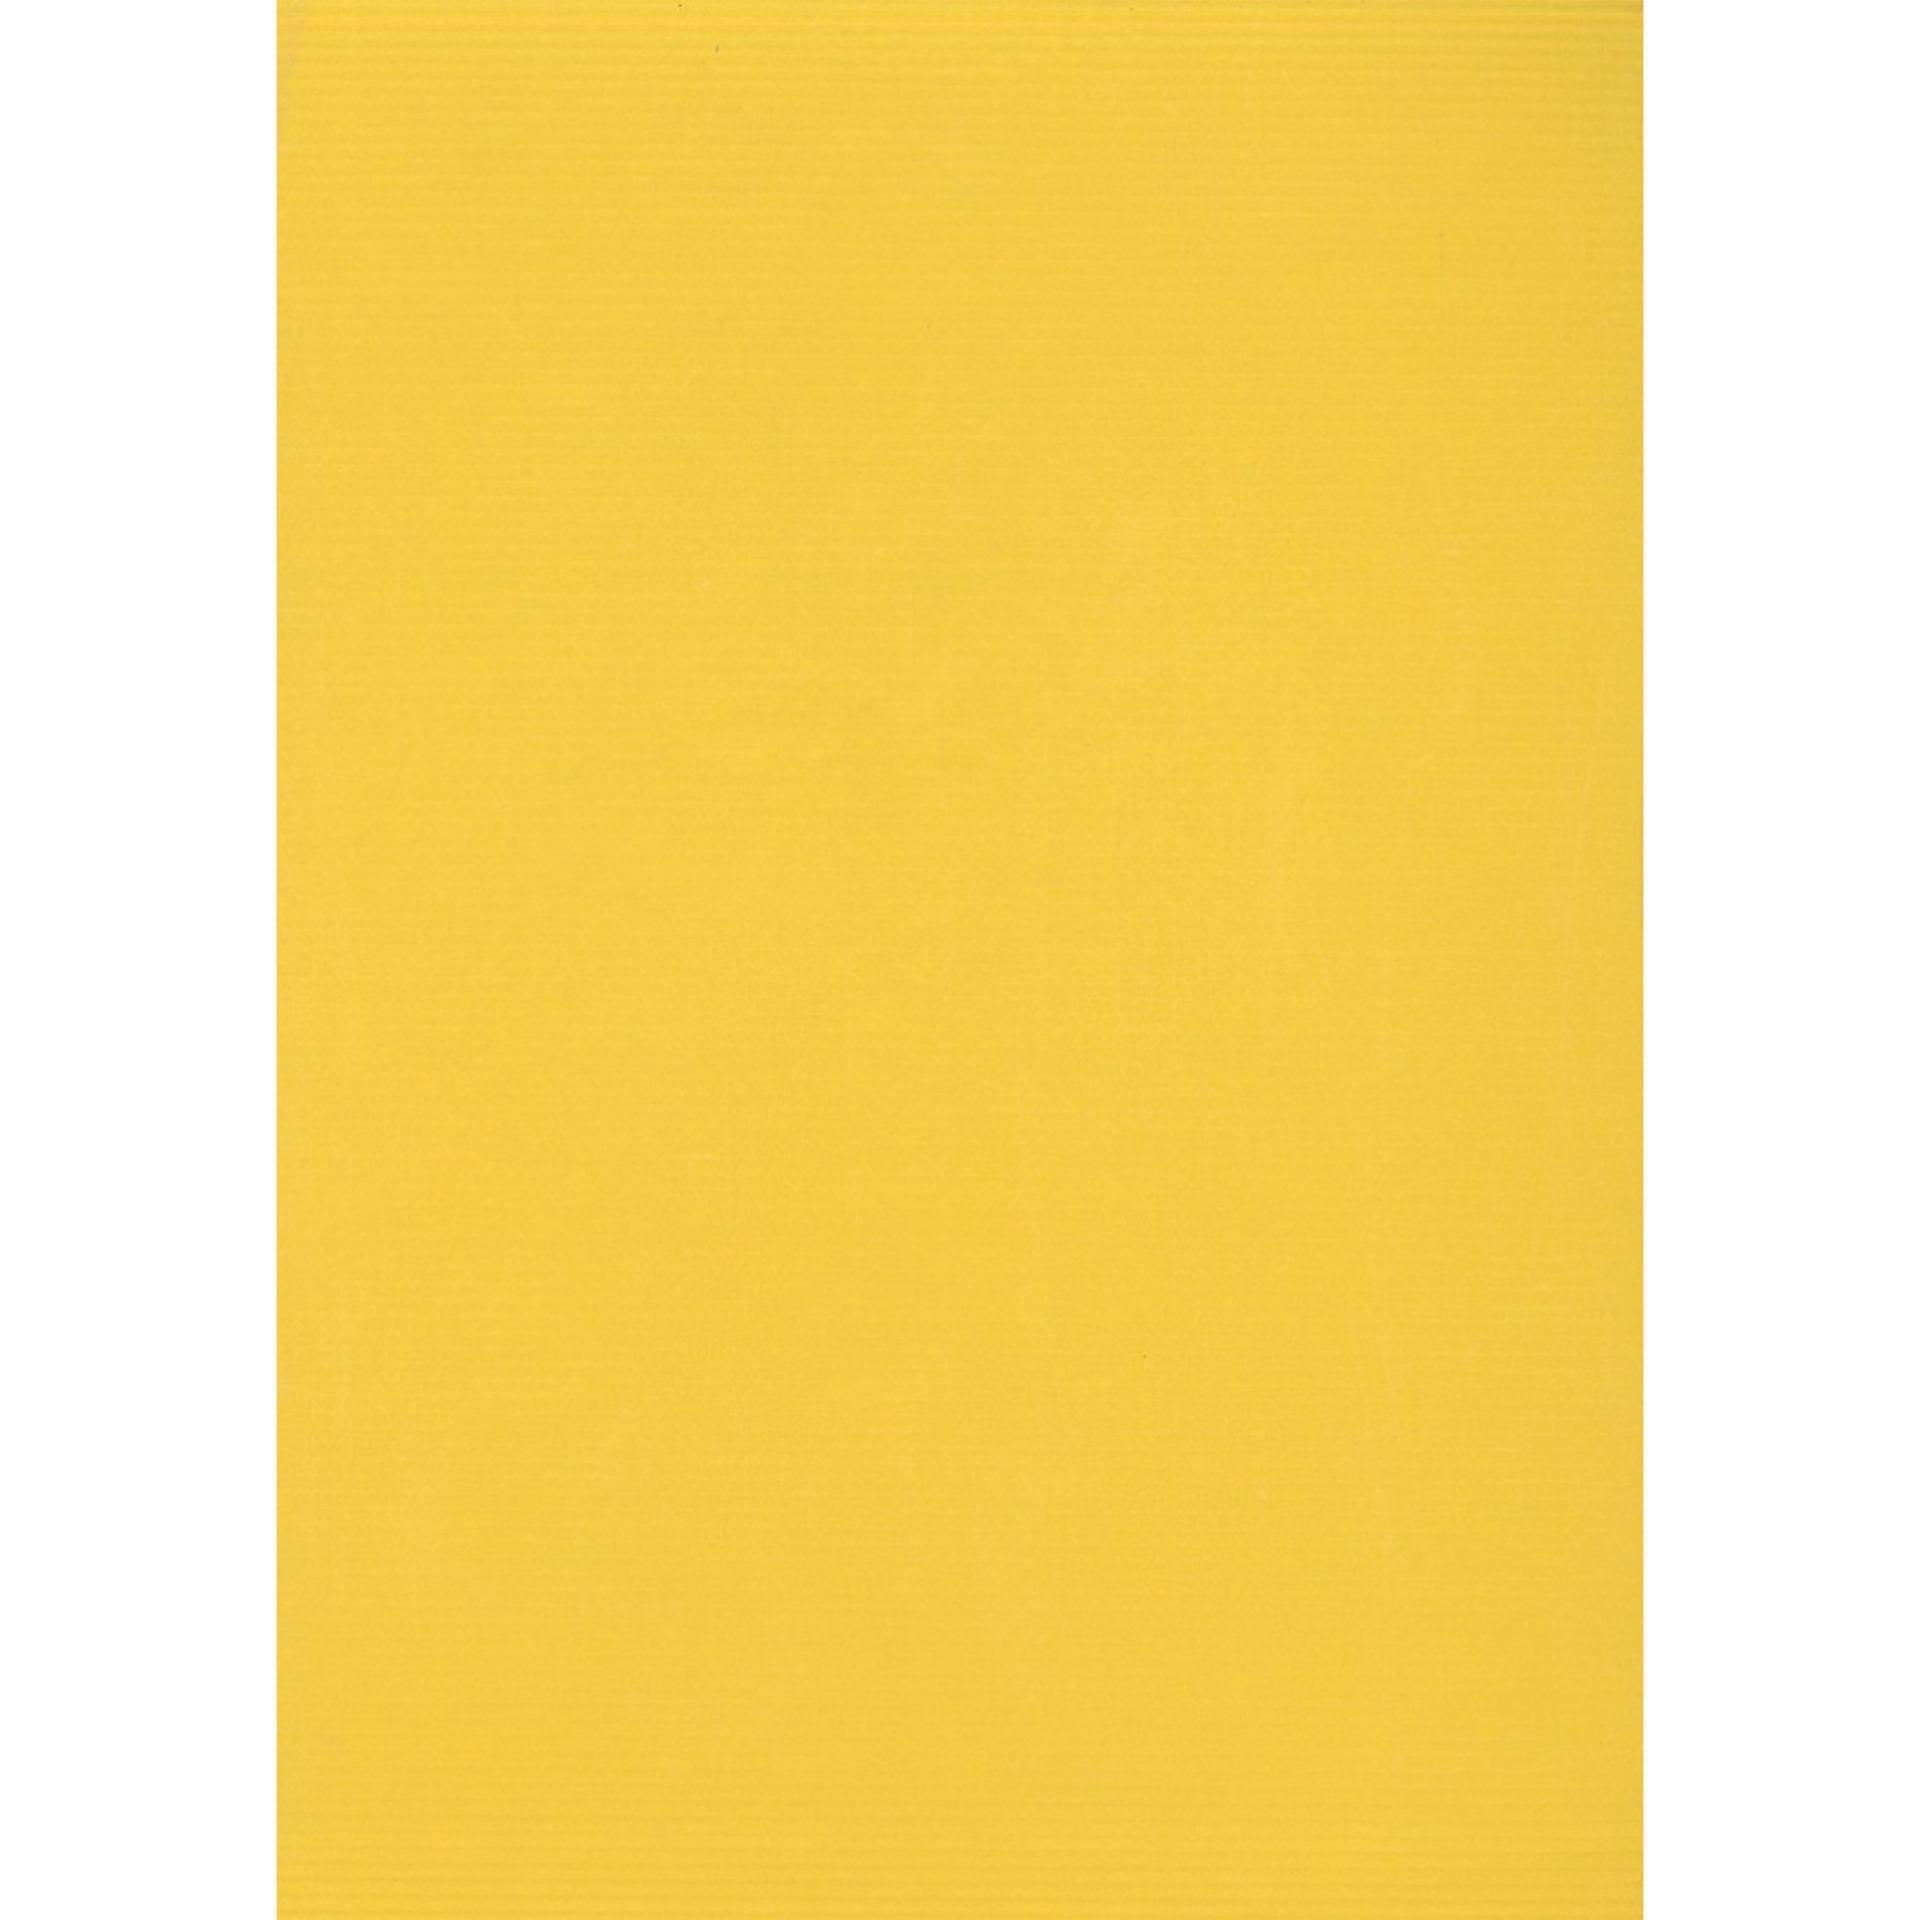 WOL - Laminate 4 x 8 thickness 0.8 mm Sheets - Waveline Breeze - HPL